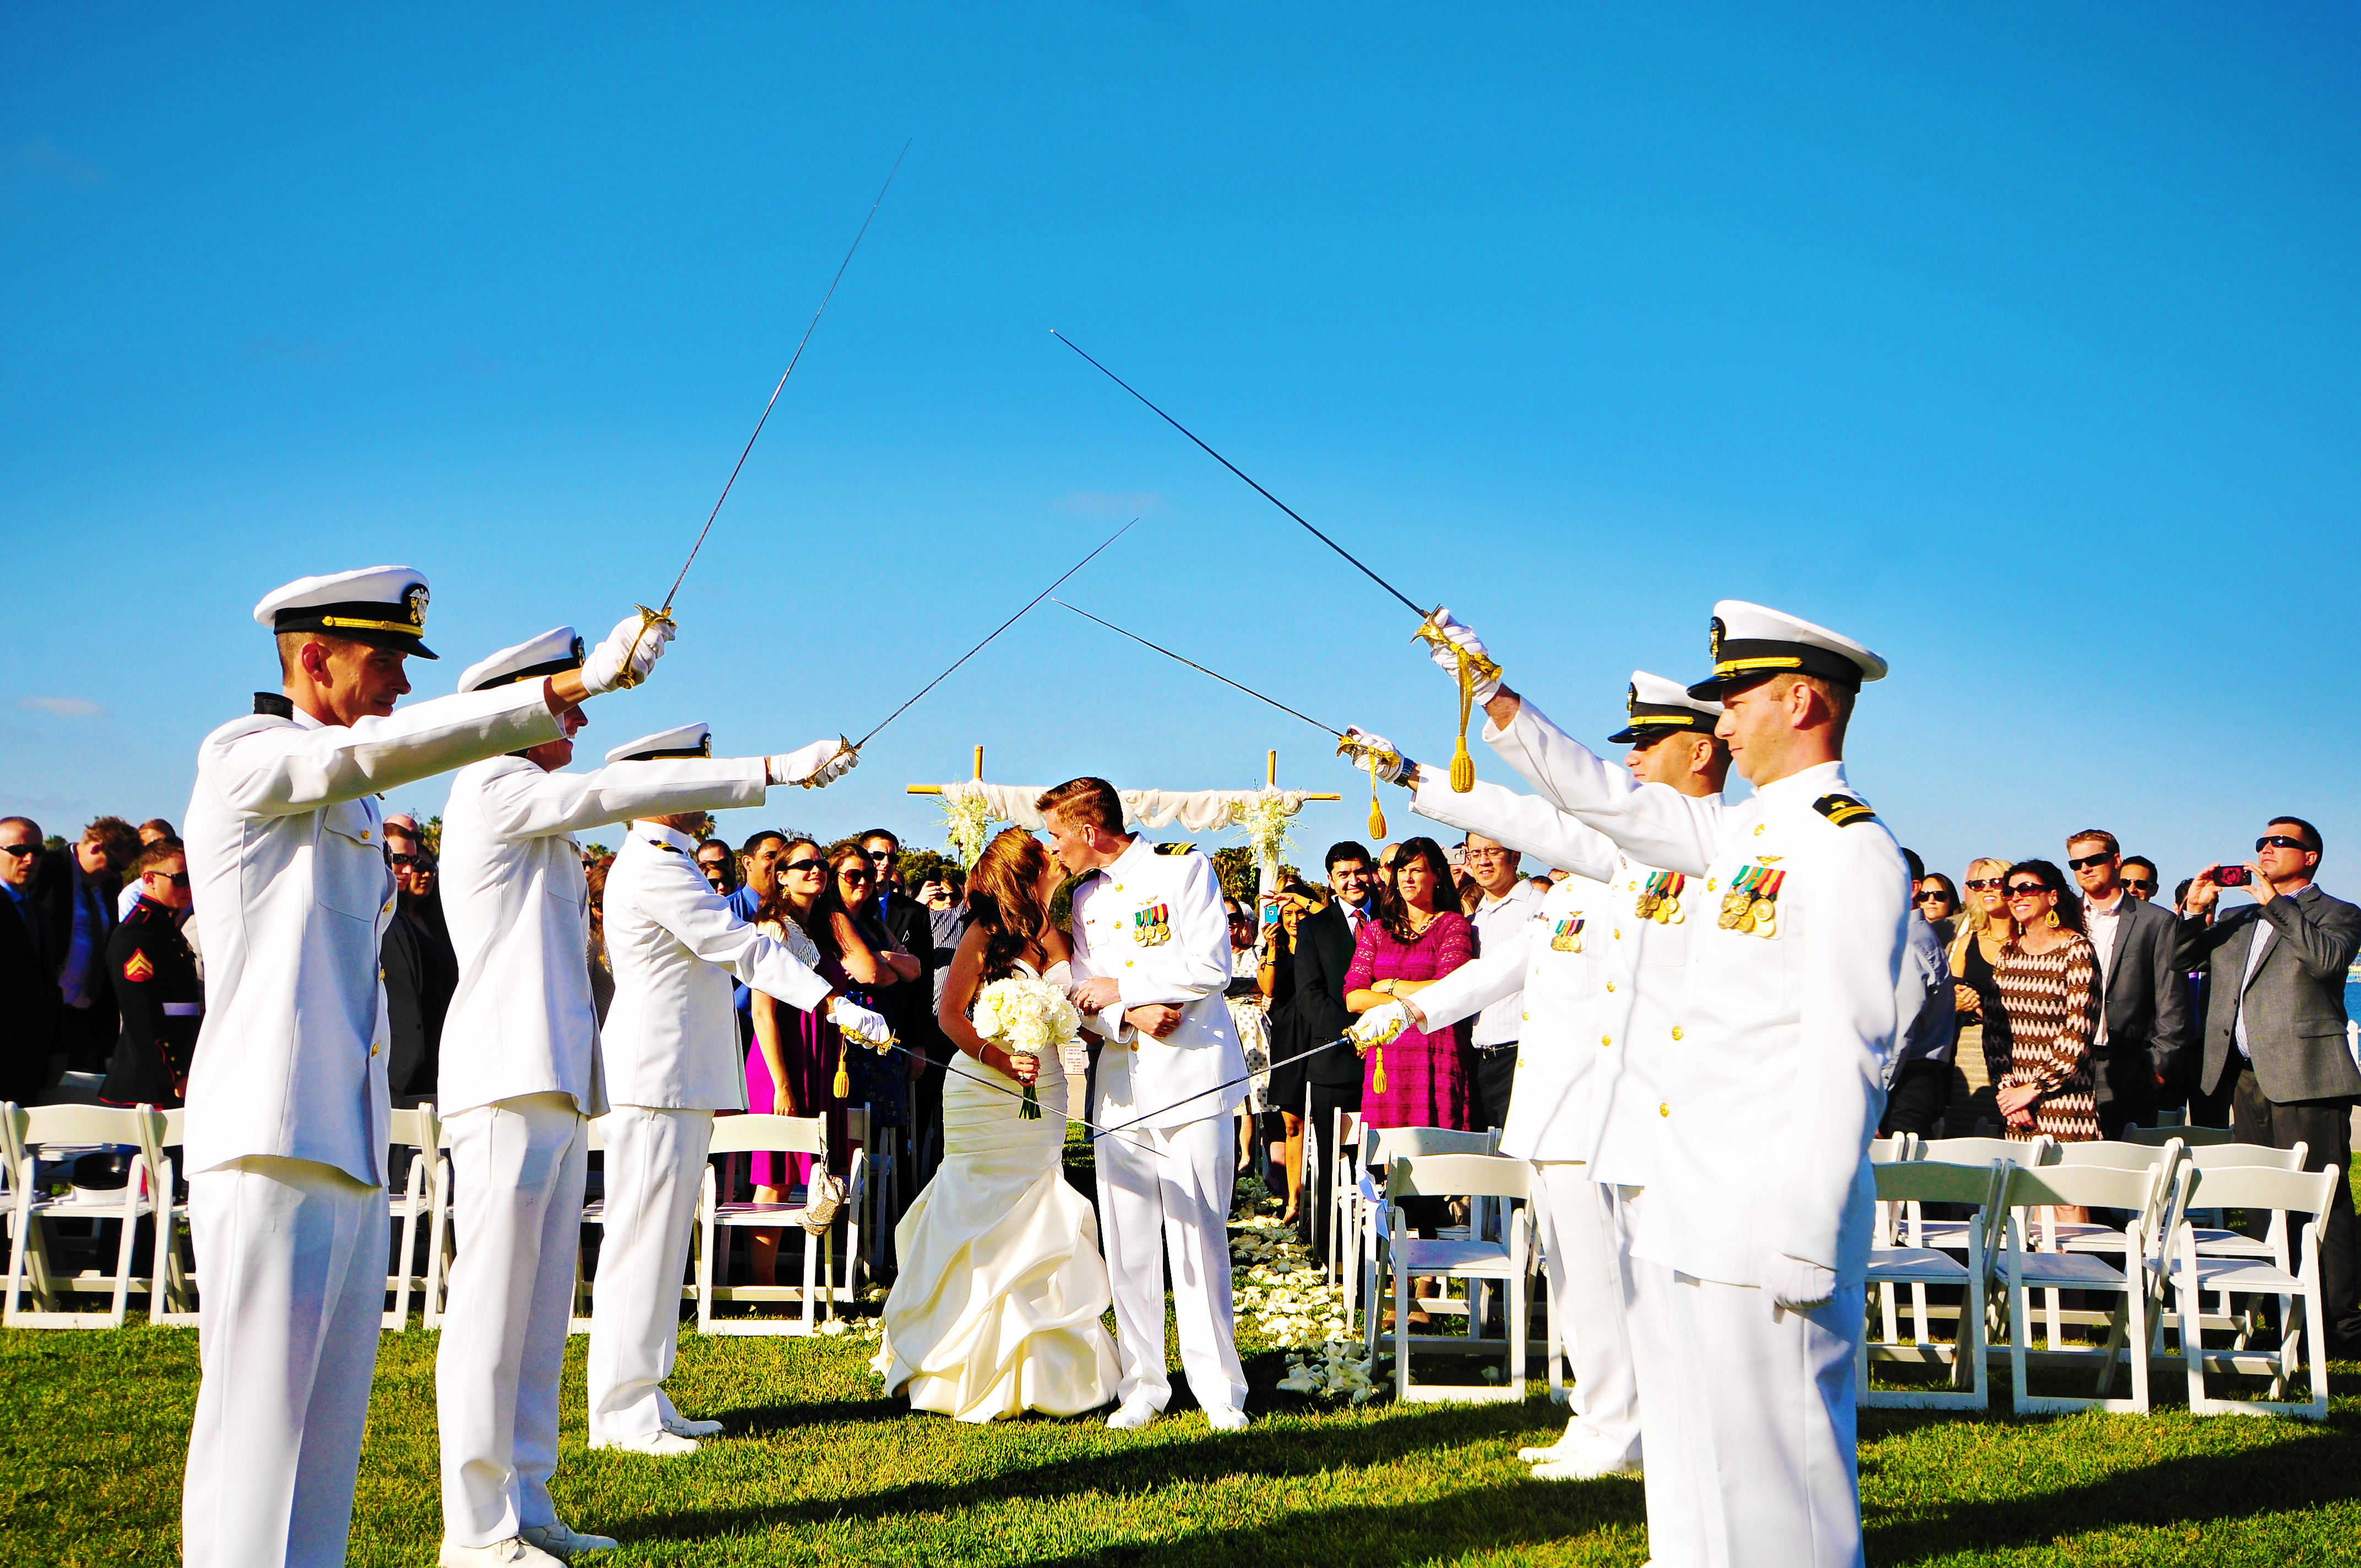 san diego ceremony, steph wong weddings, southern california wedding ceremony, beach ceremony